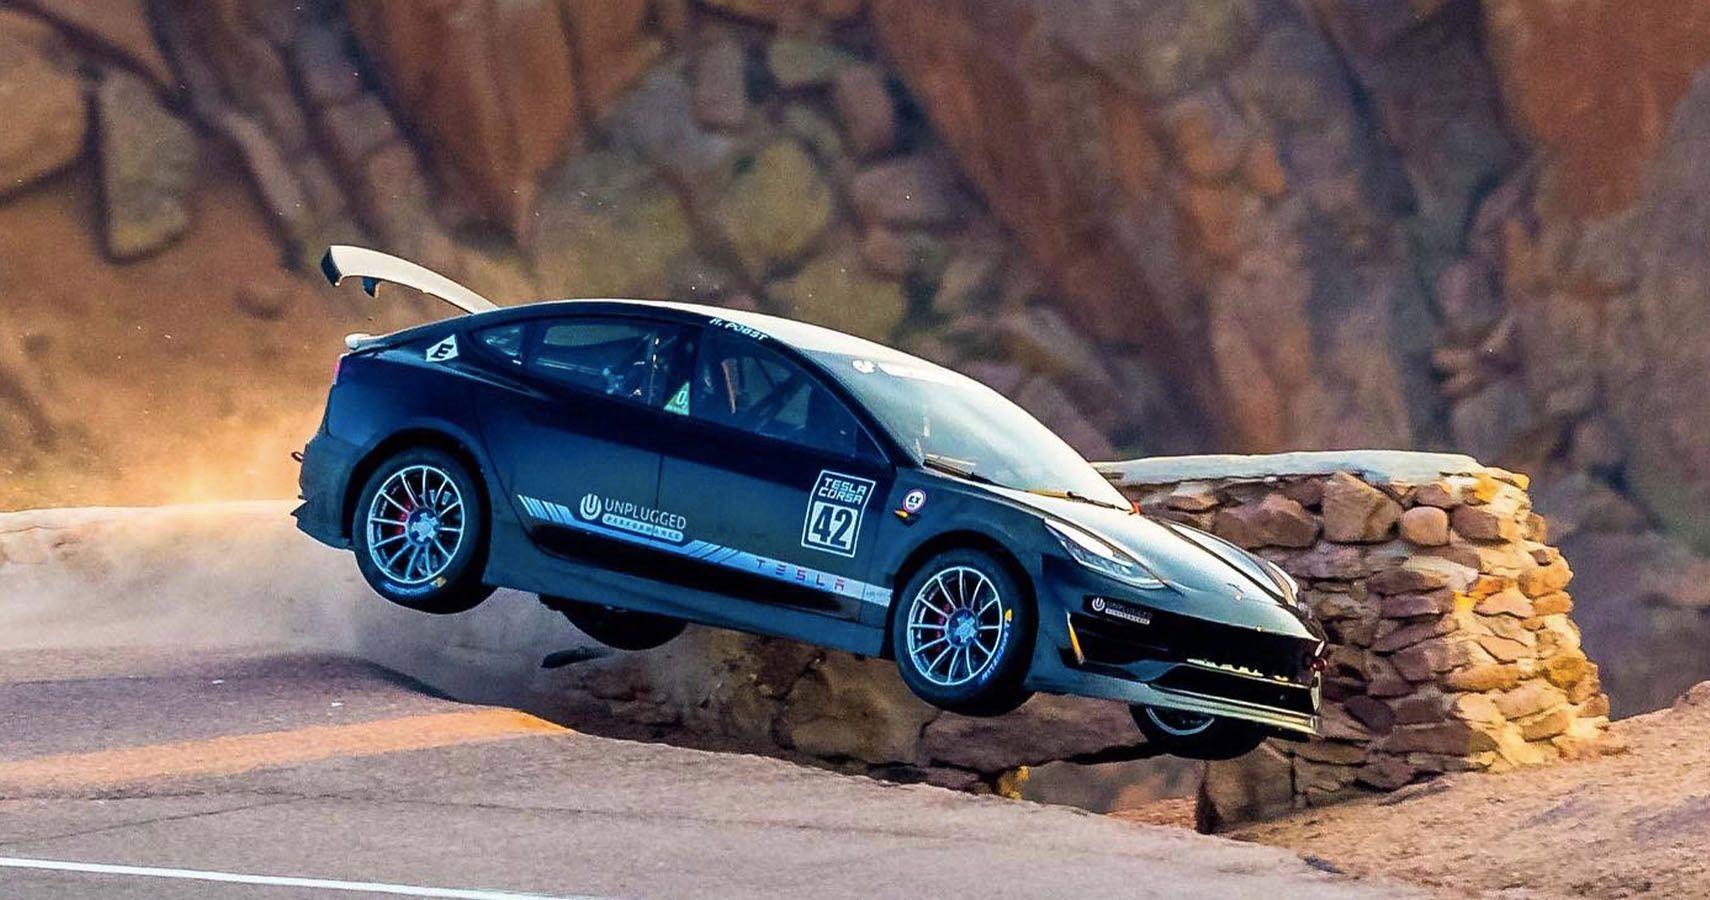 Watch A Tesla Model 3 Dominating Pikes Peak Before Spectacular Crash